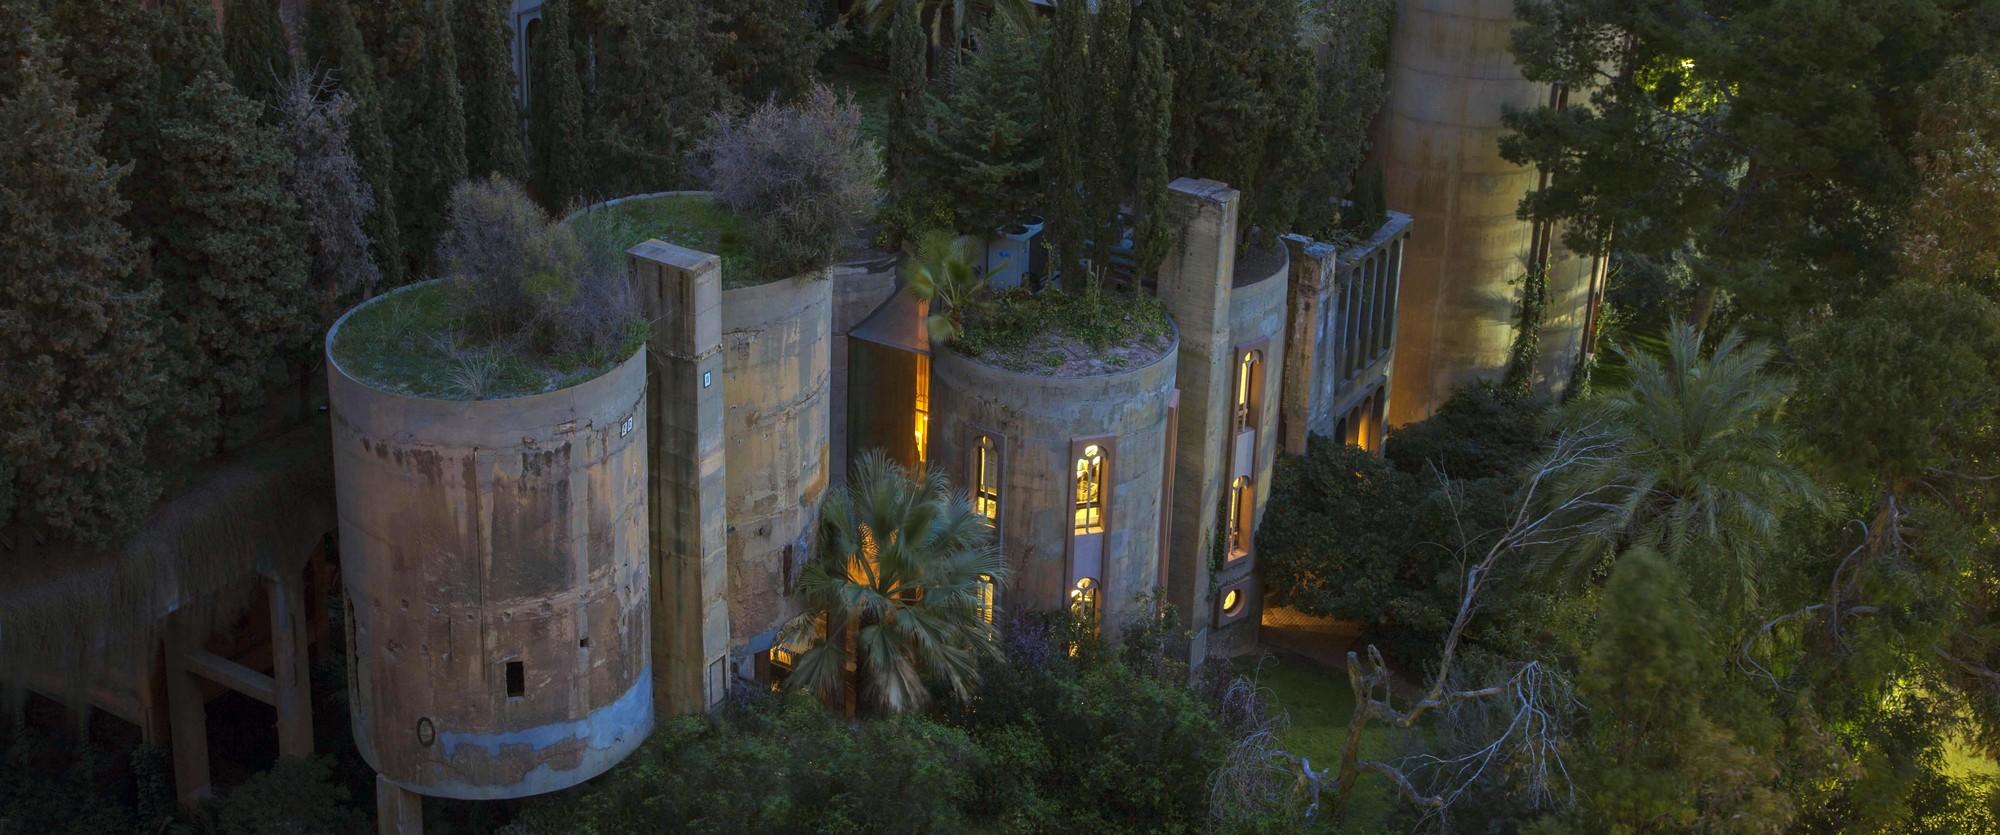 Ricardo_Bofill_Taller_Arquitectura_SantJustDesvern_Barcelona_Spain_OutdoorSpaces_(3)